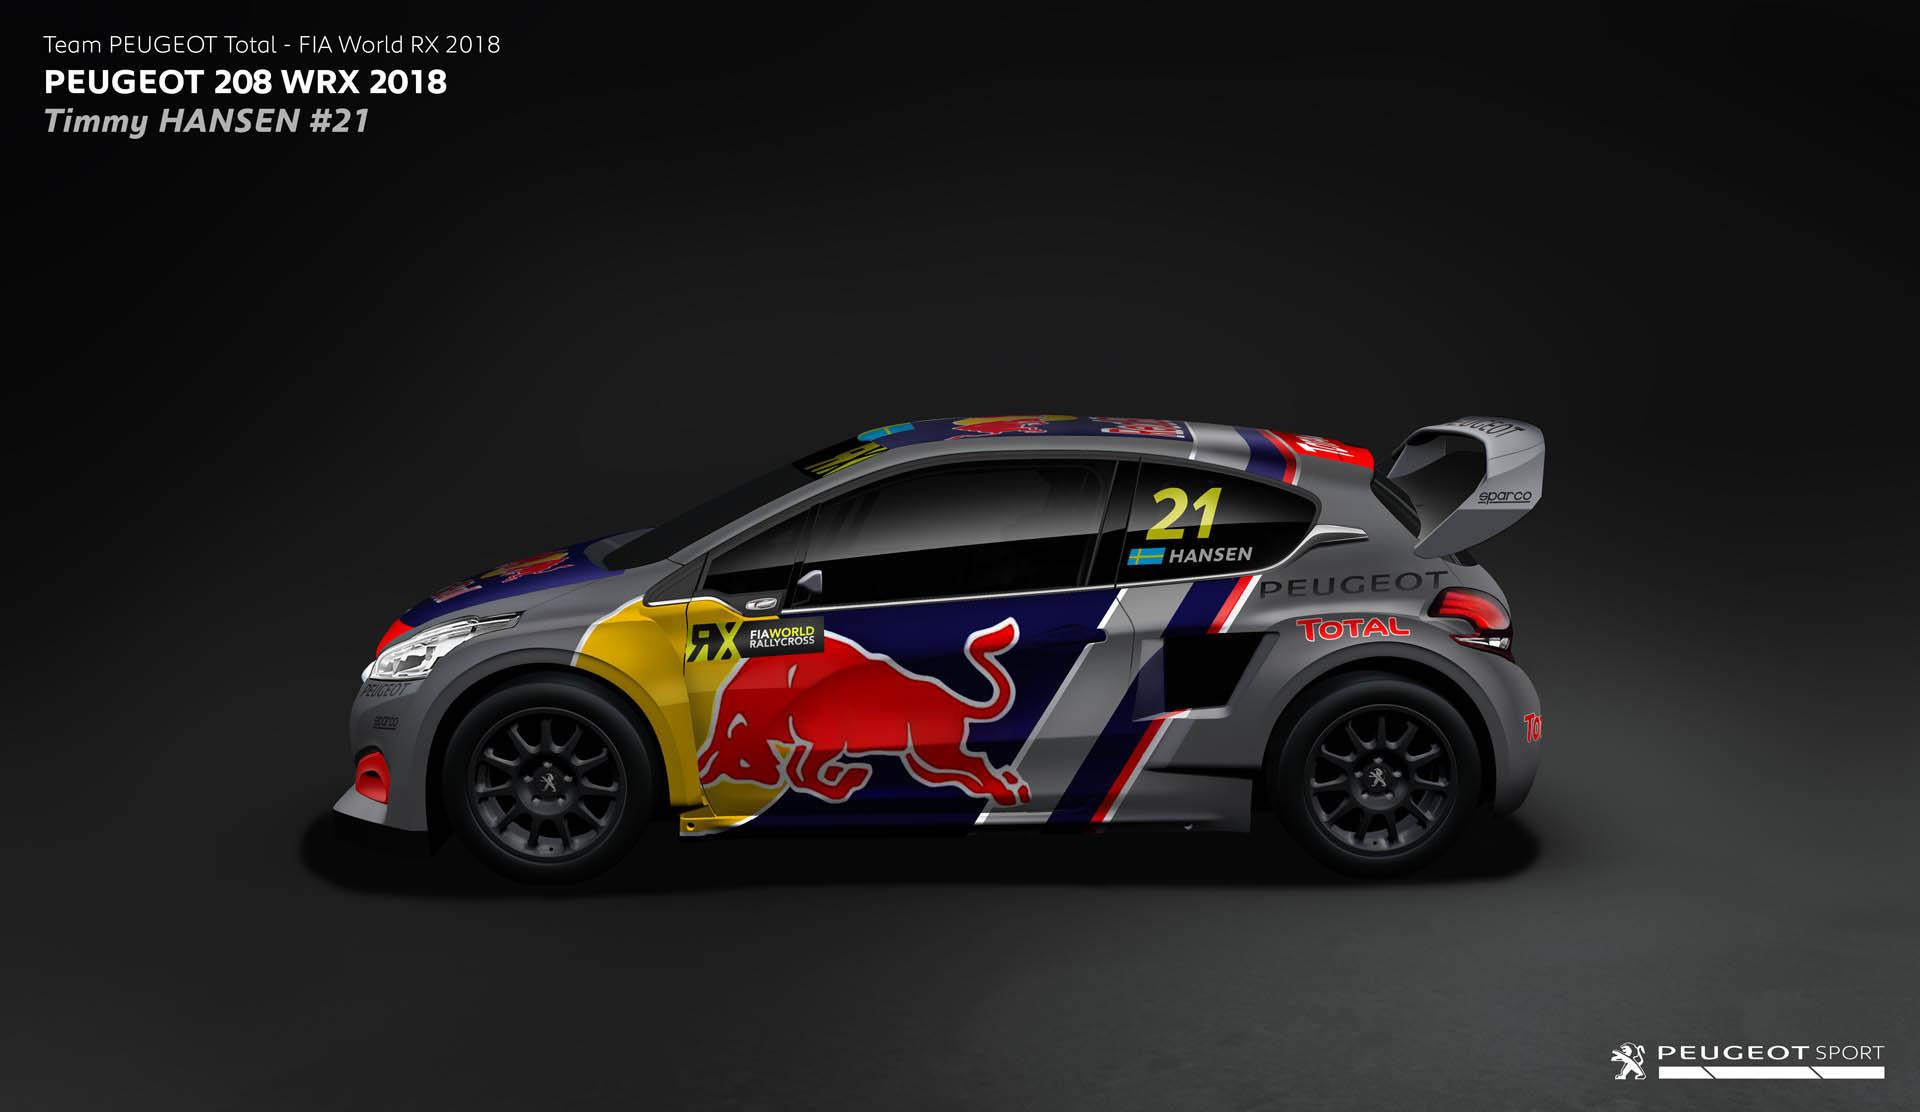 Peugeot 208 WRX 2018 (2)